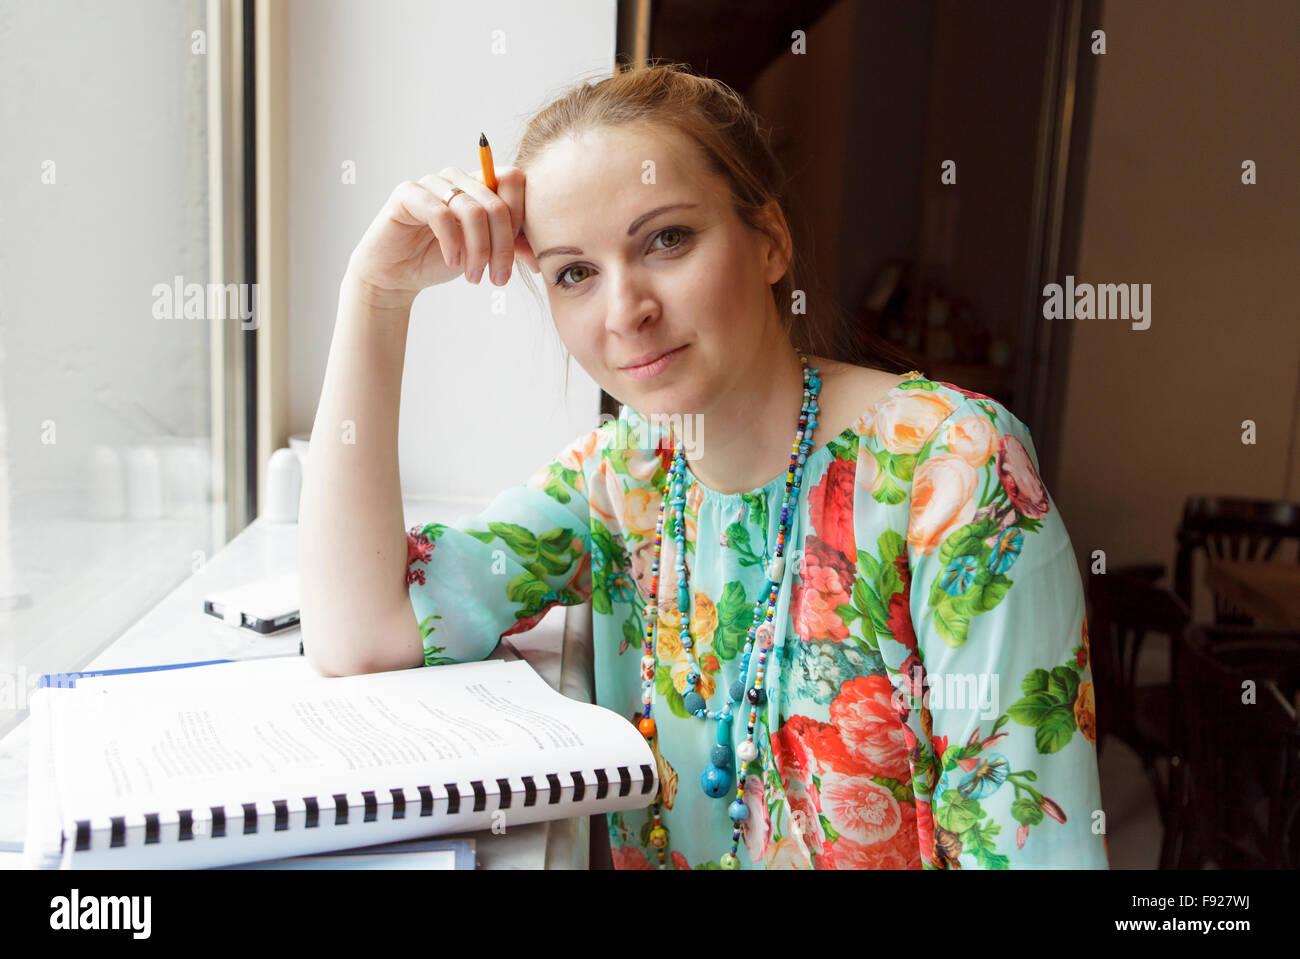 Junge Frau in das Café zu studieren Stockbild